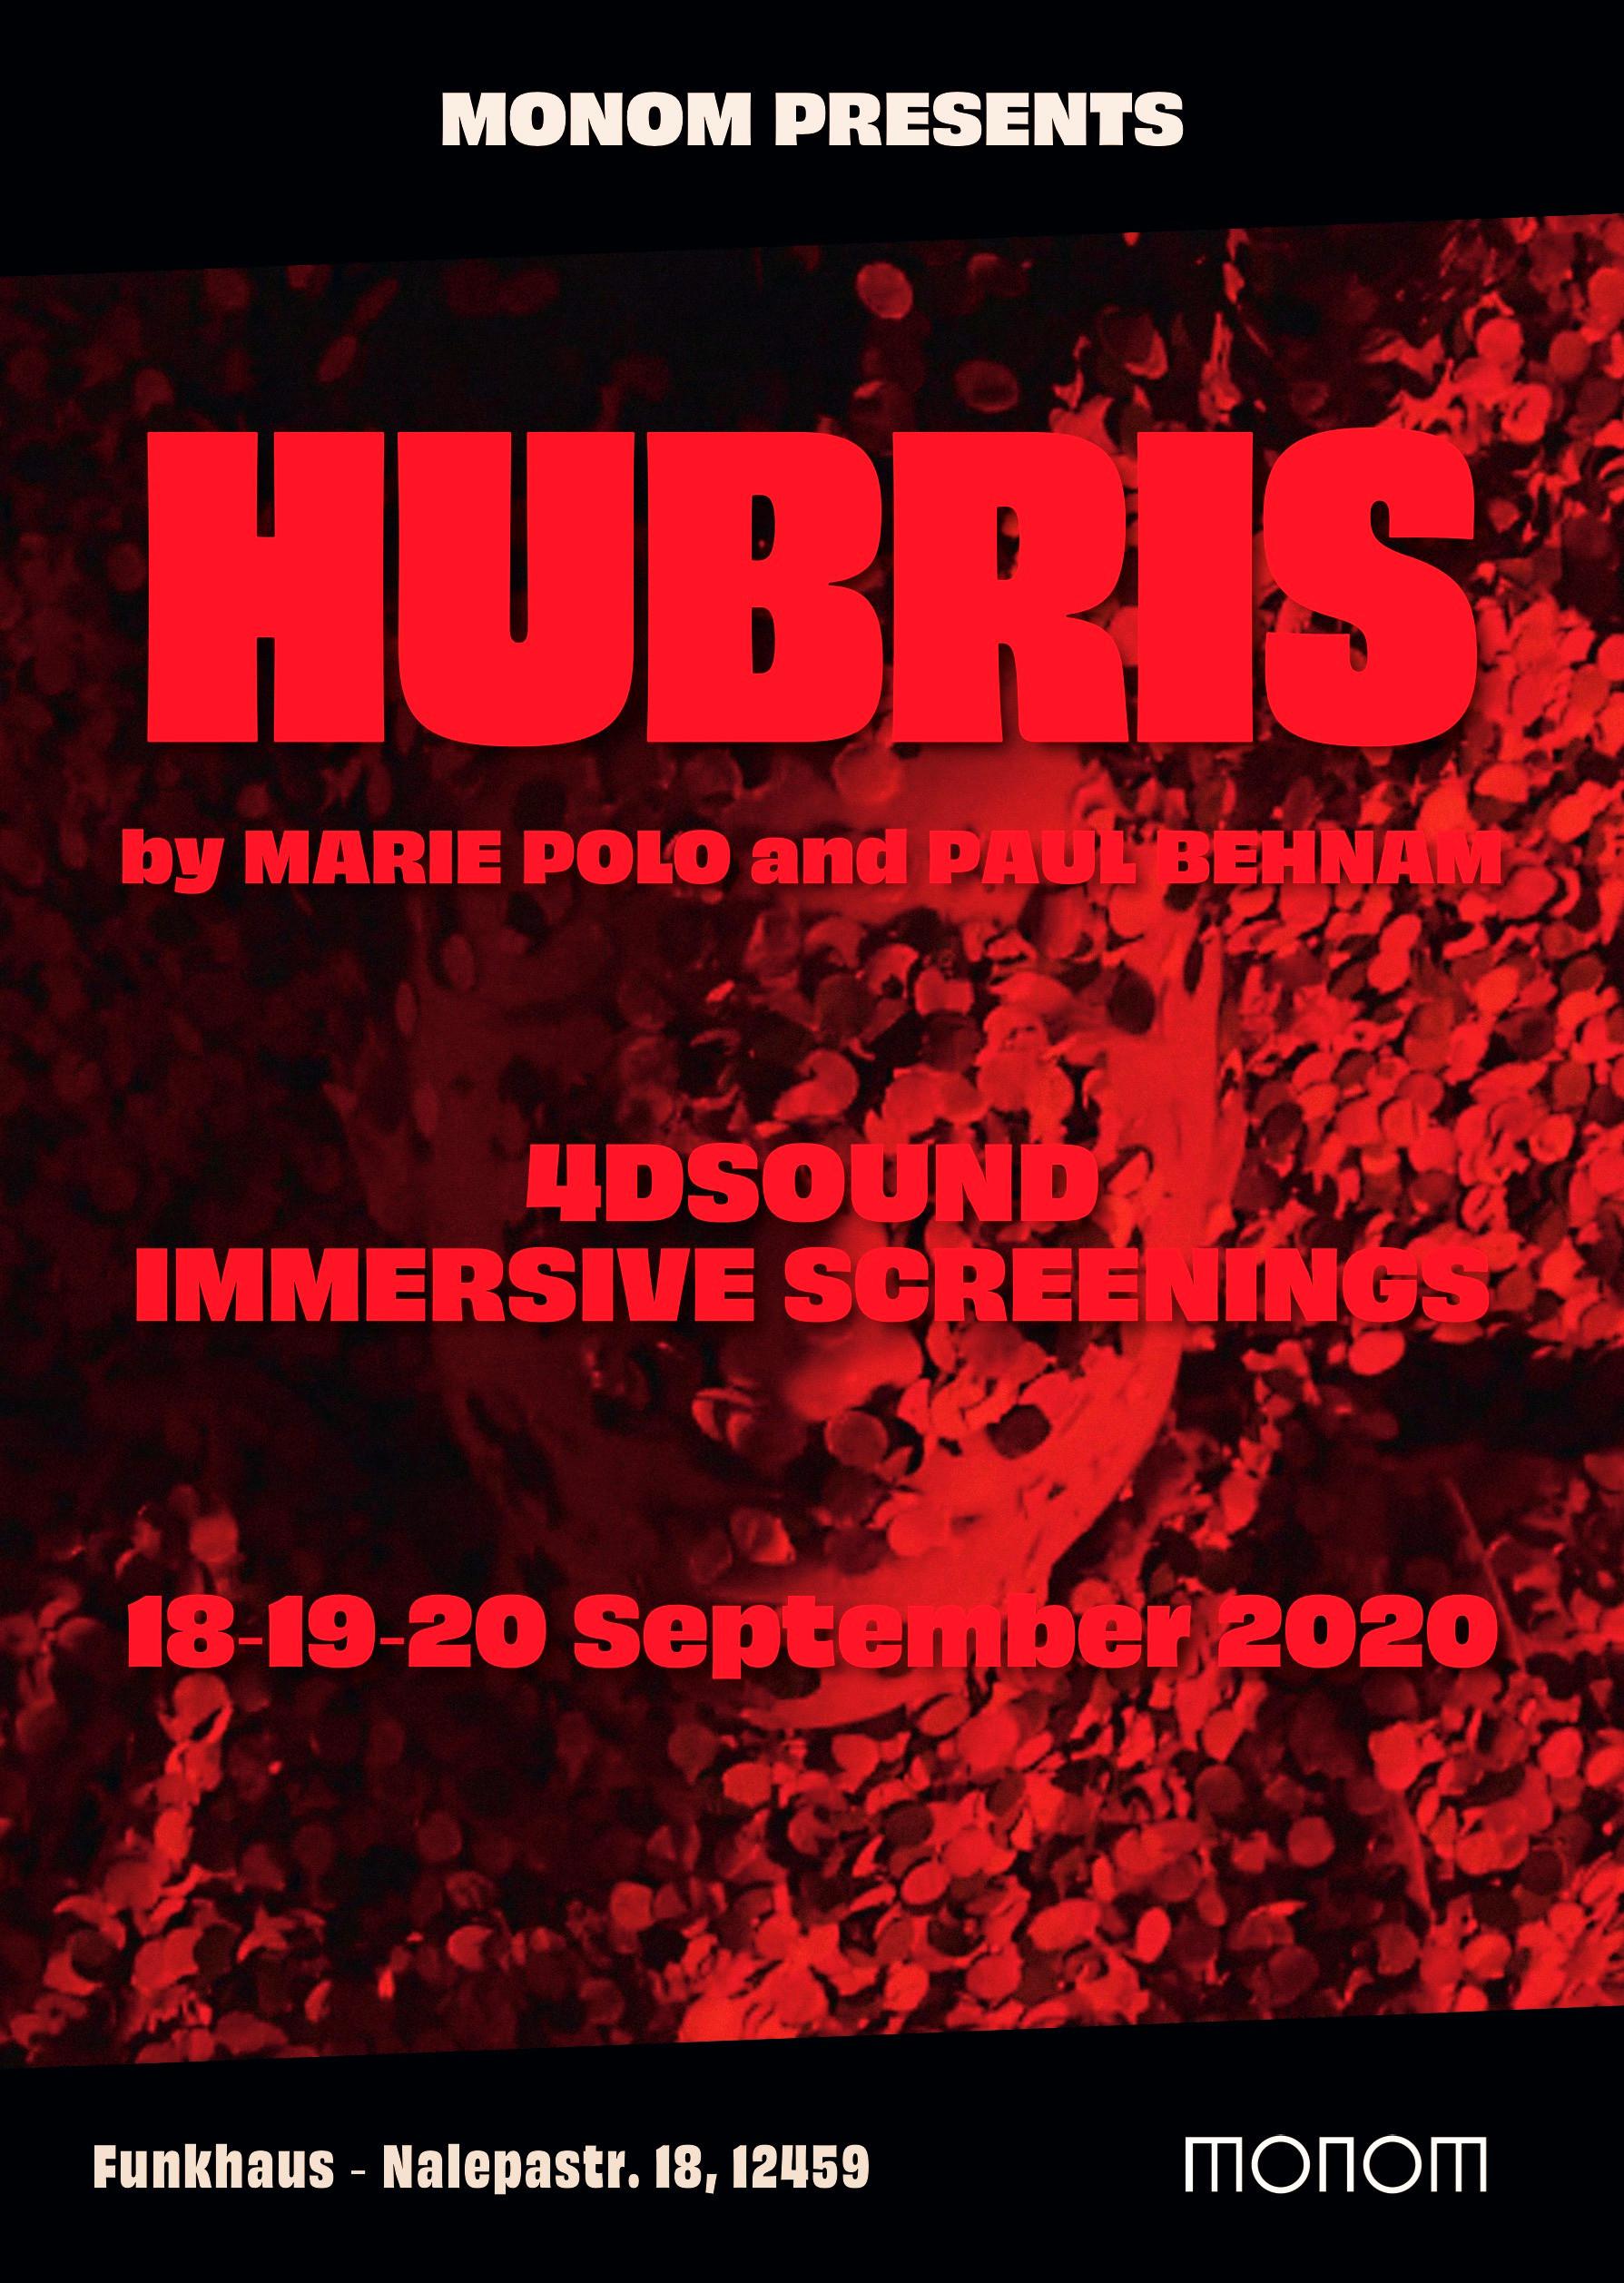 HUBRIS AT MONOM